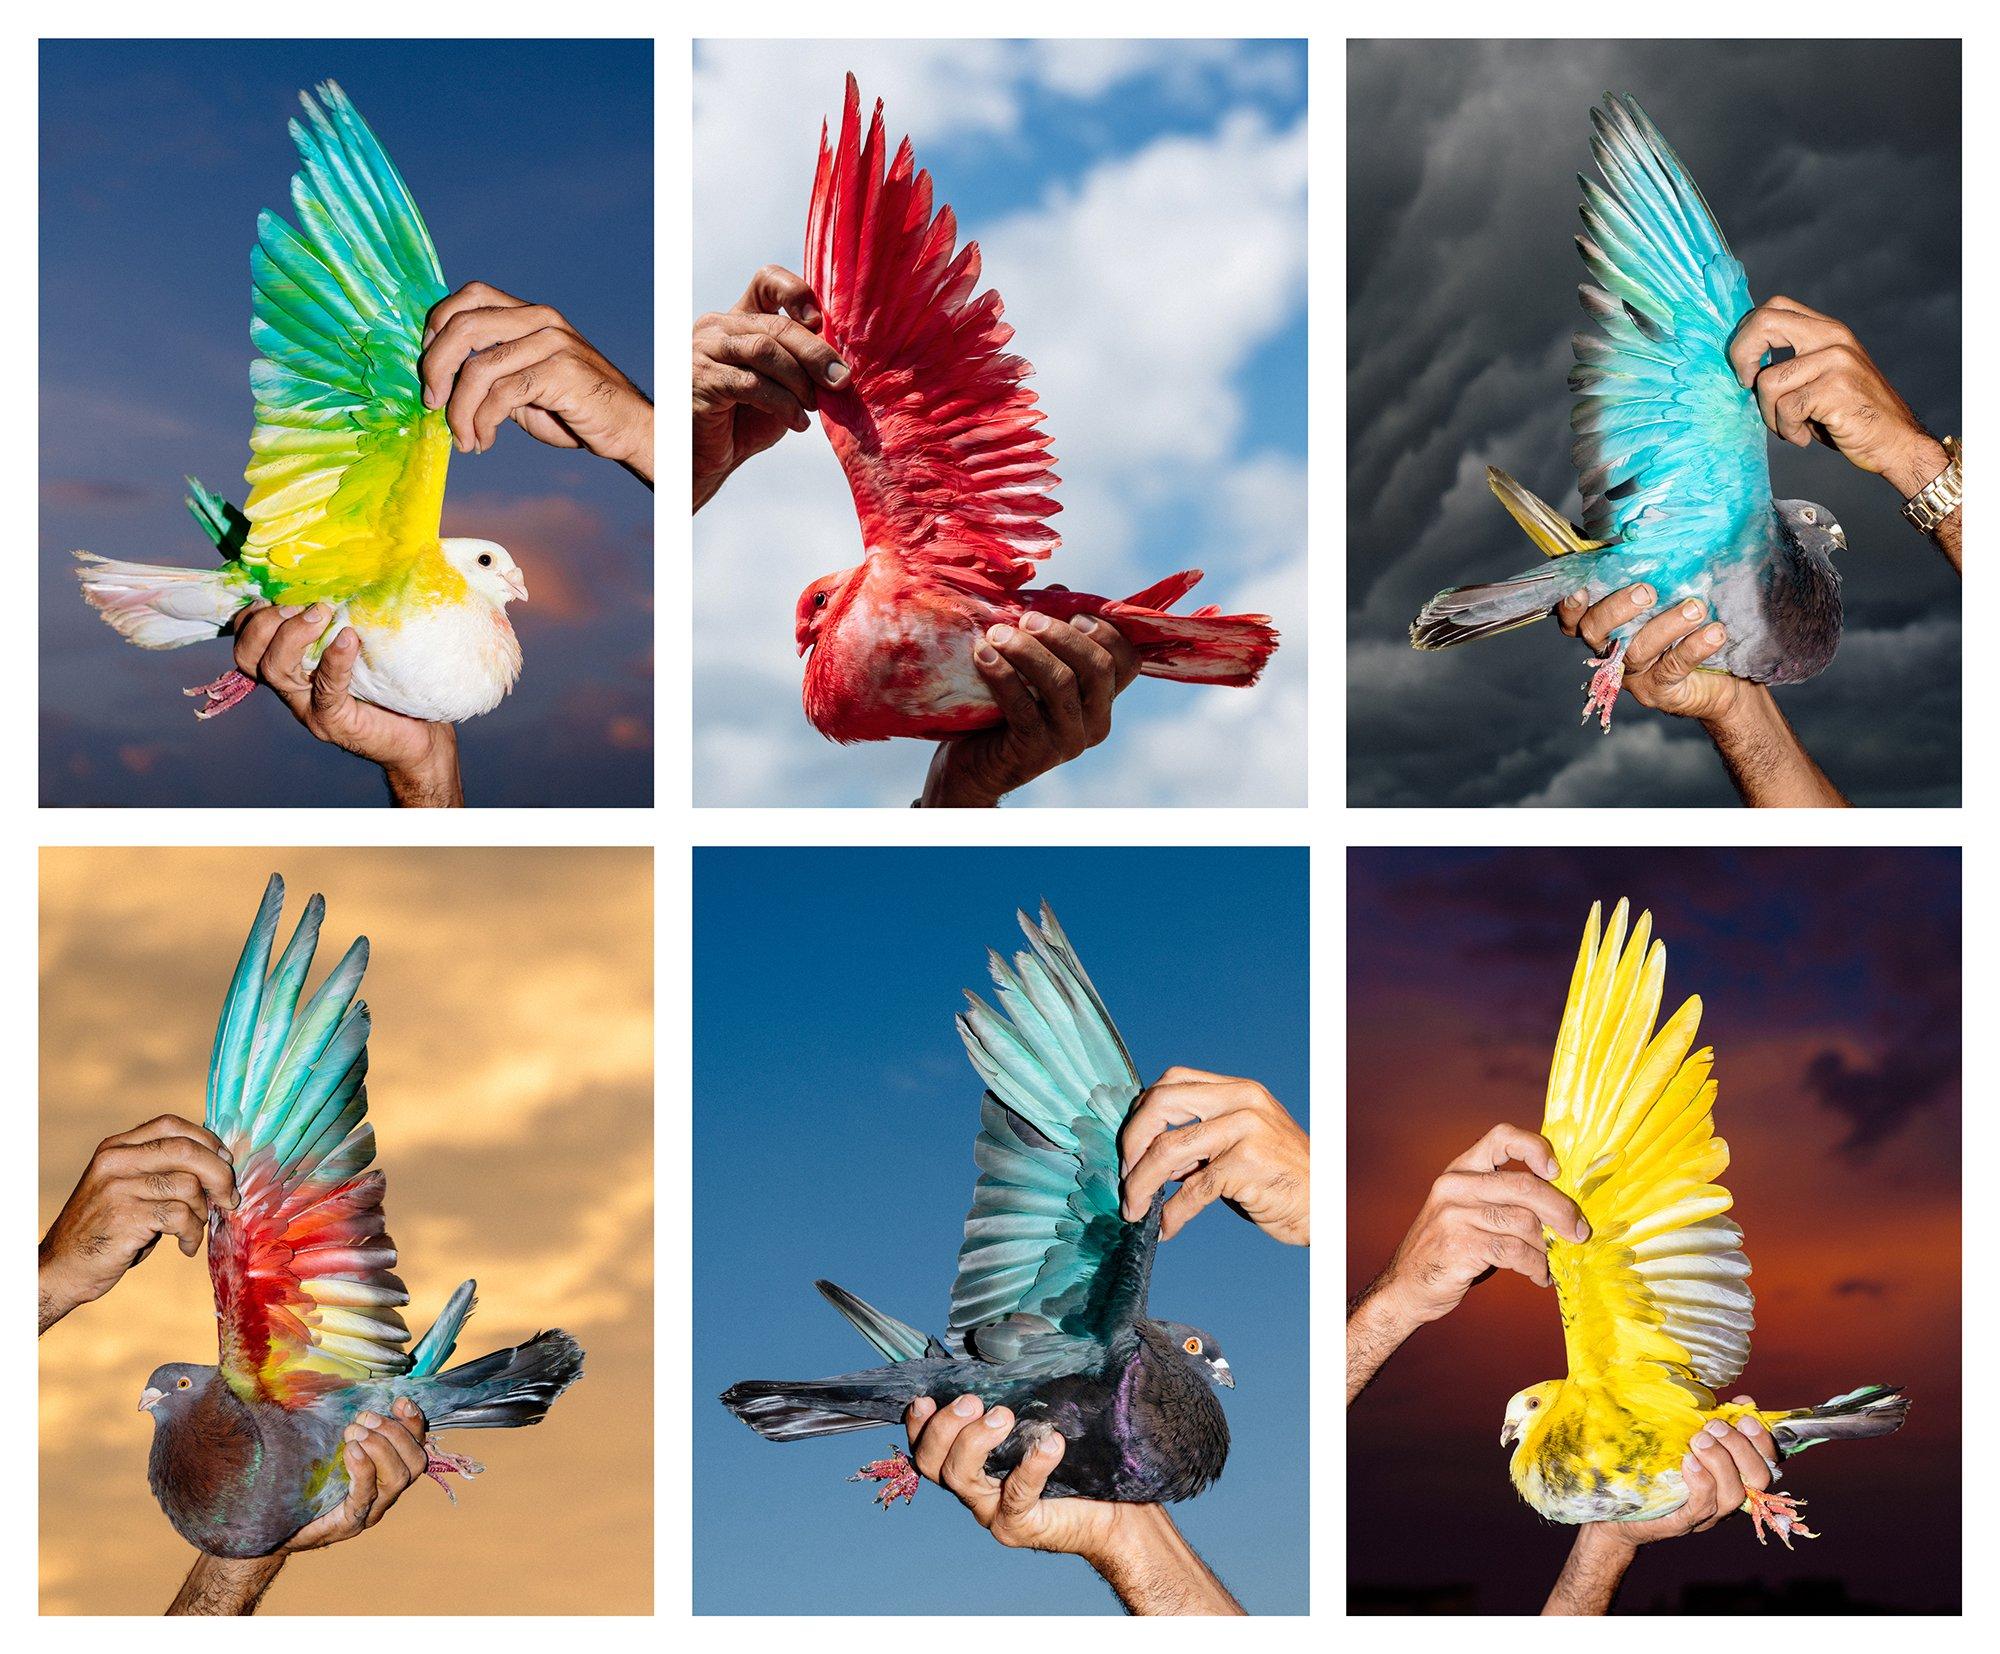 Vibrant photos of Cuban pigeon racing: https://t.co/PGWo9IlLib https://t.co/I1Q1NXpkqX